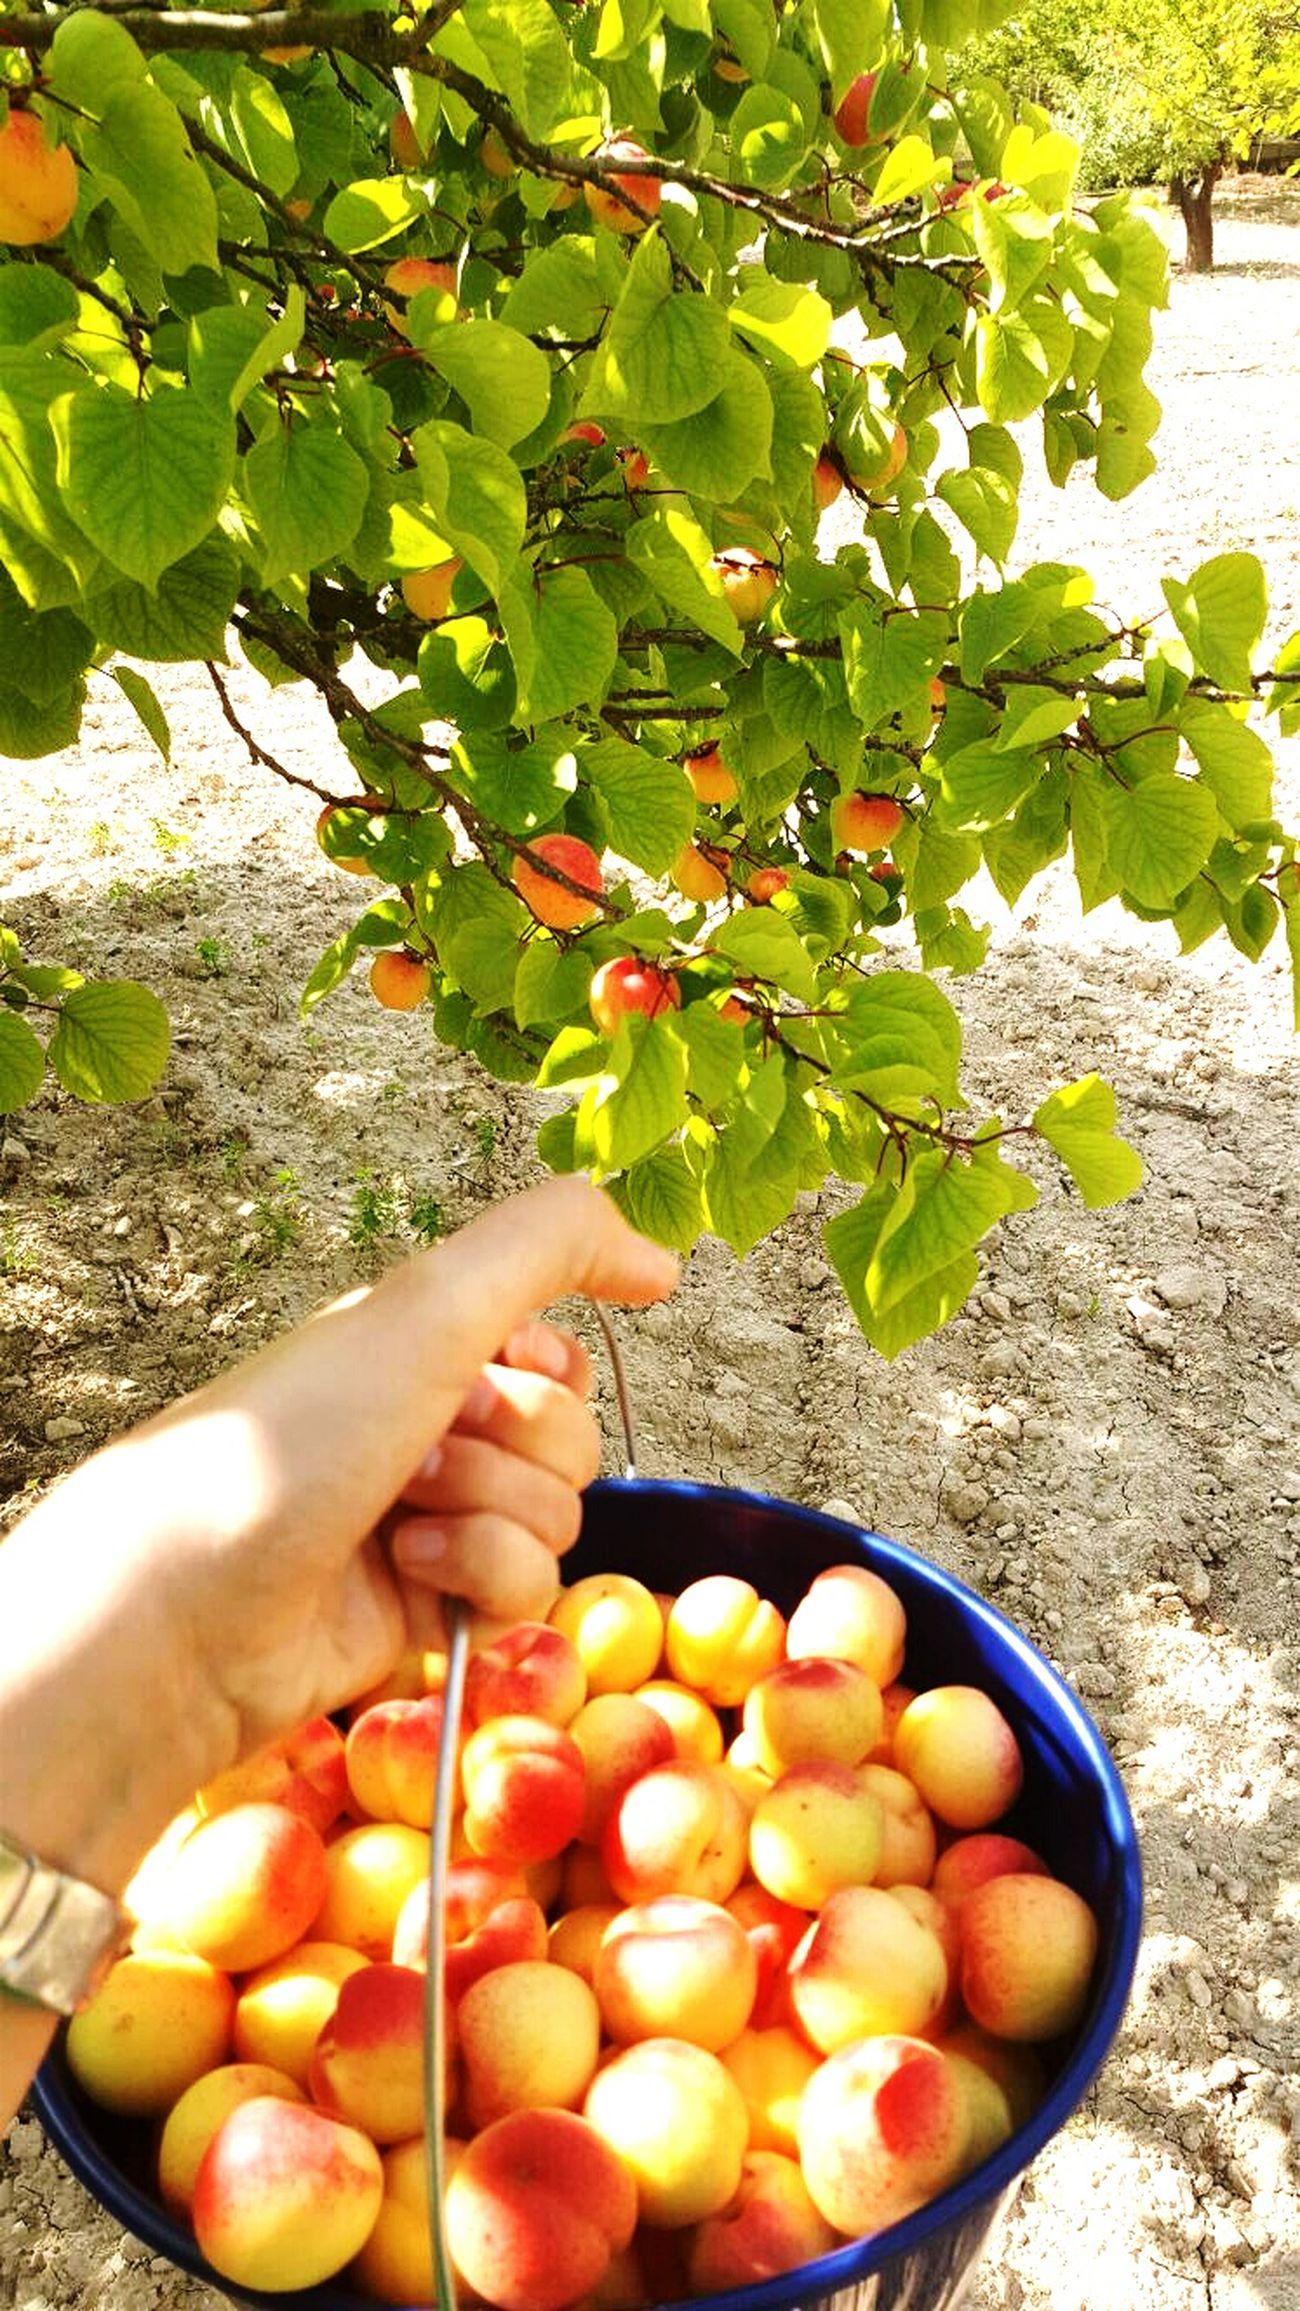 ShareTheMeal Apricot Tree Fruit Healthy Eating Tropical Fruit Nature Village Work Summer Tree Natura Beautiful